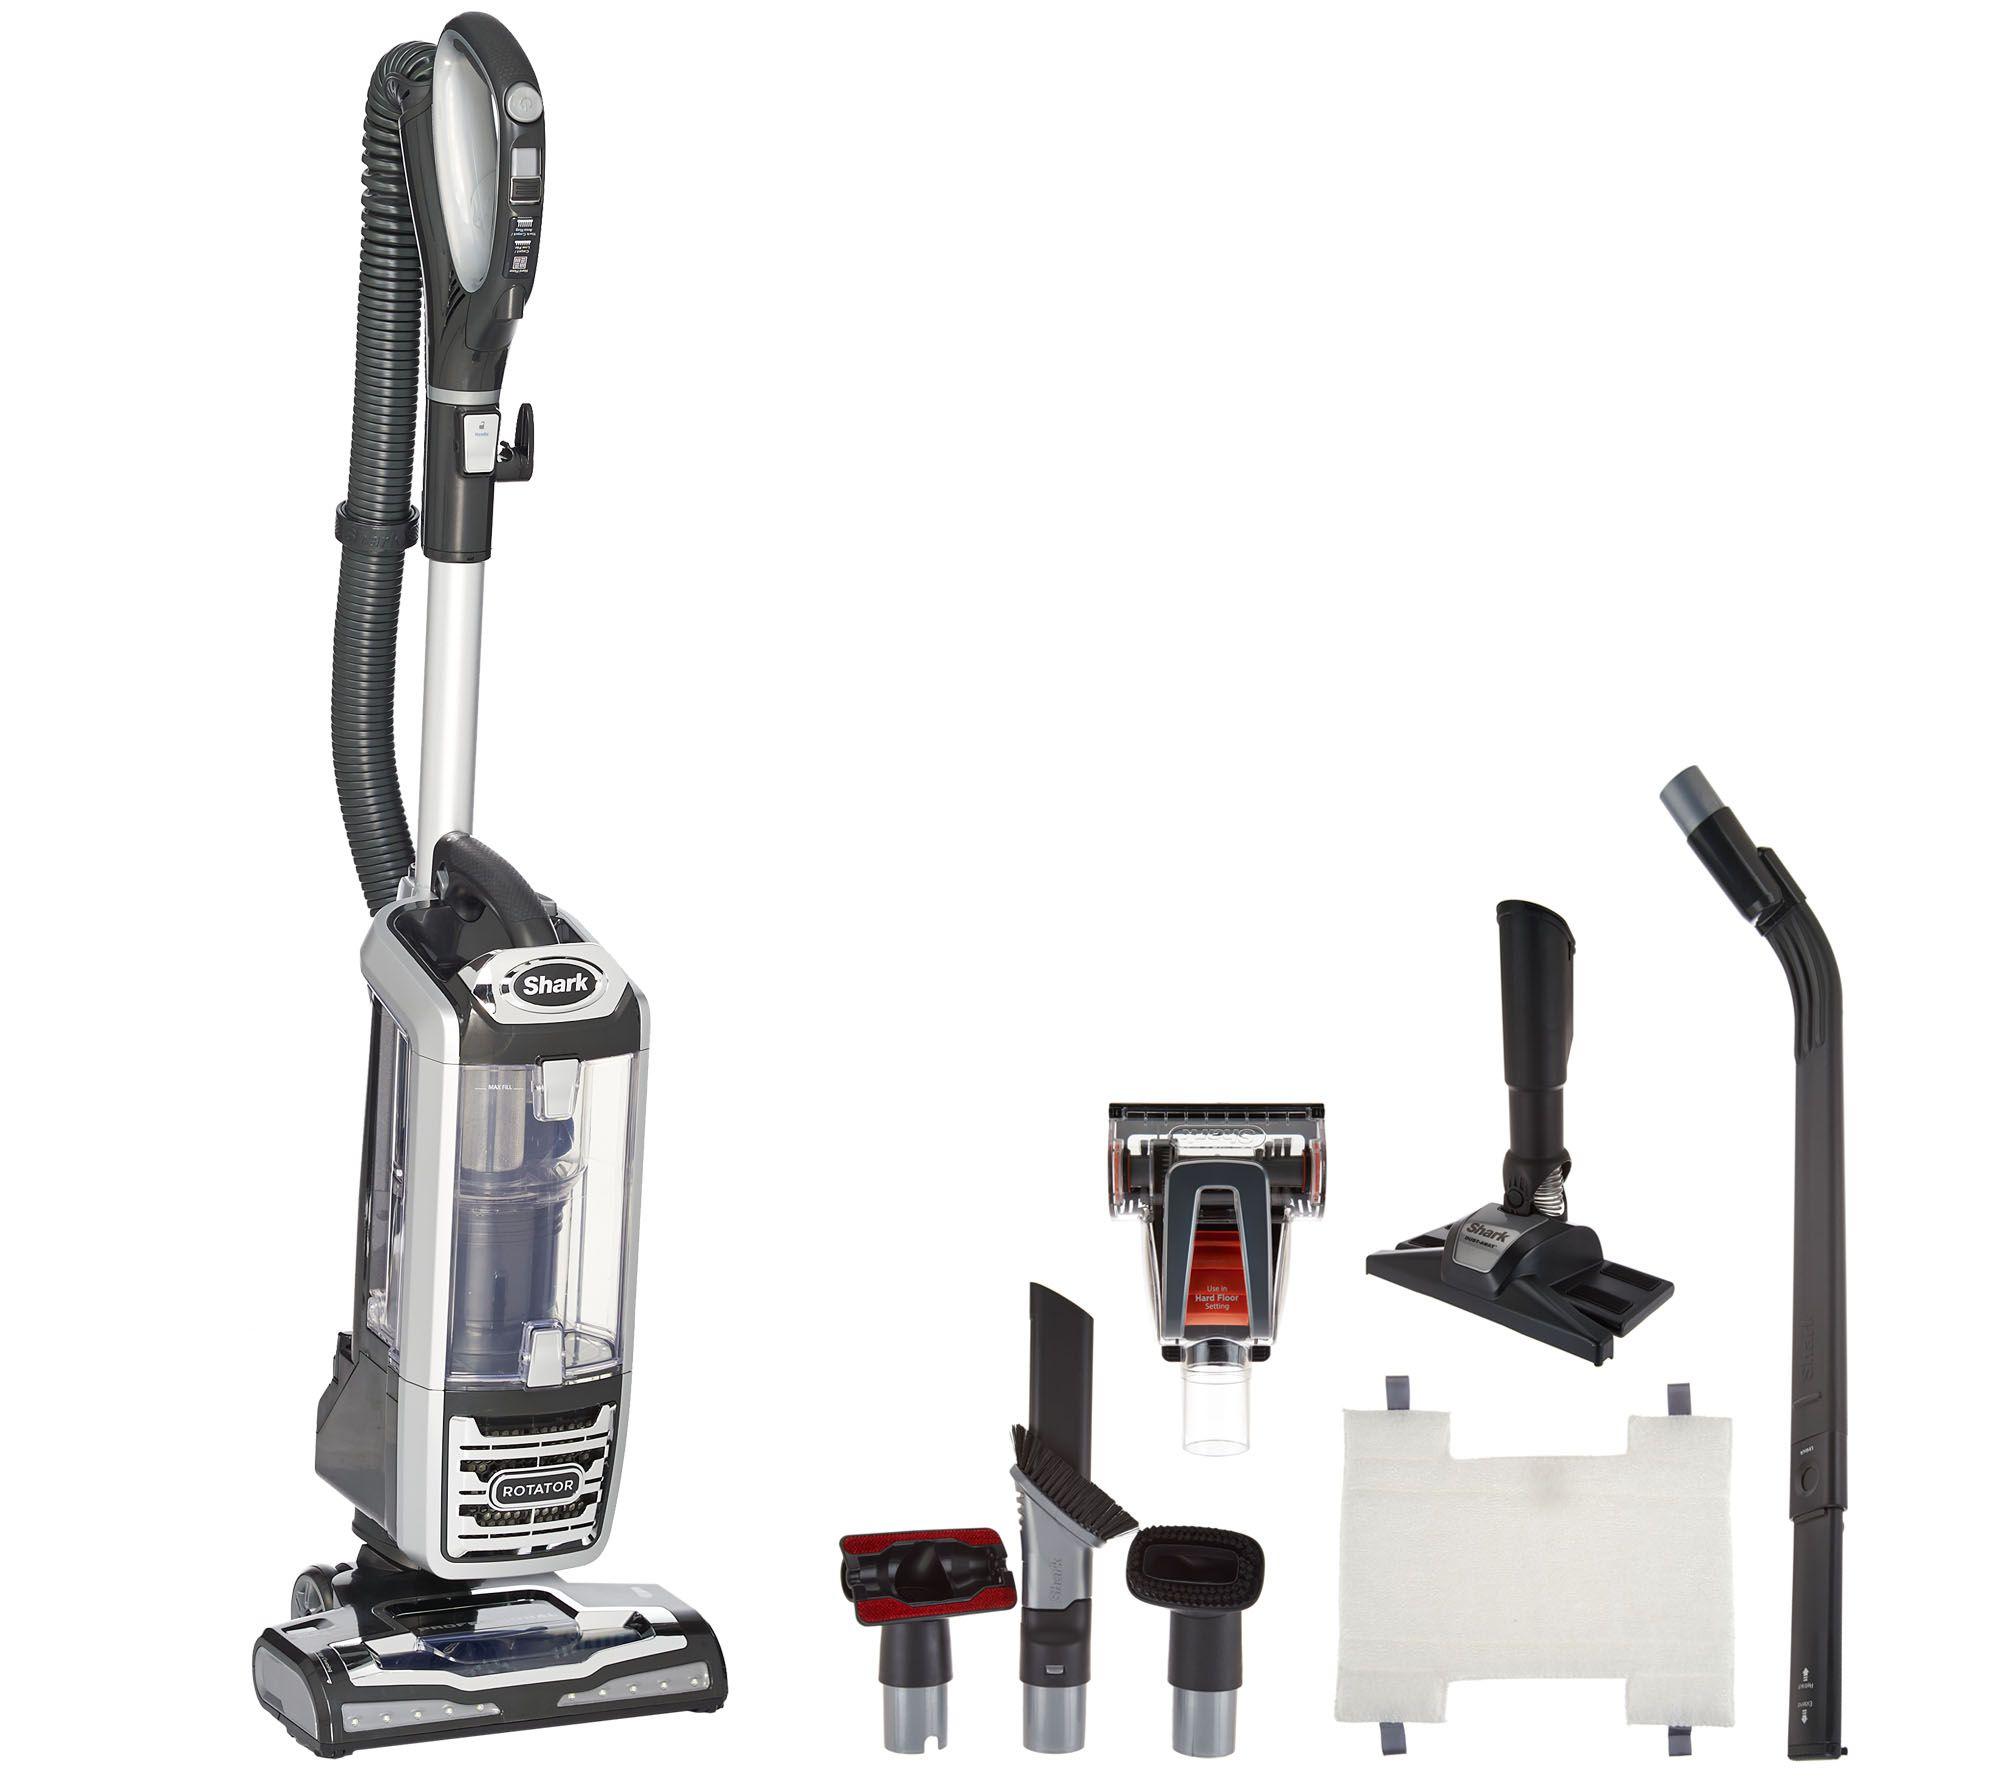 Shark Rotator Powered LiftAway DLX Vacuum with 8